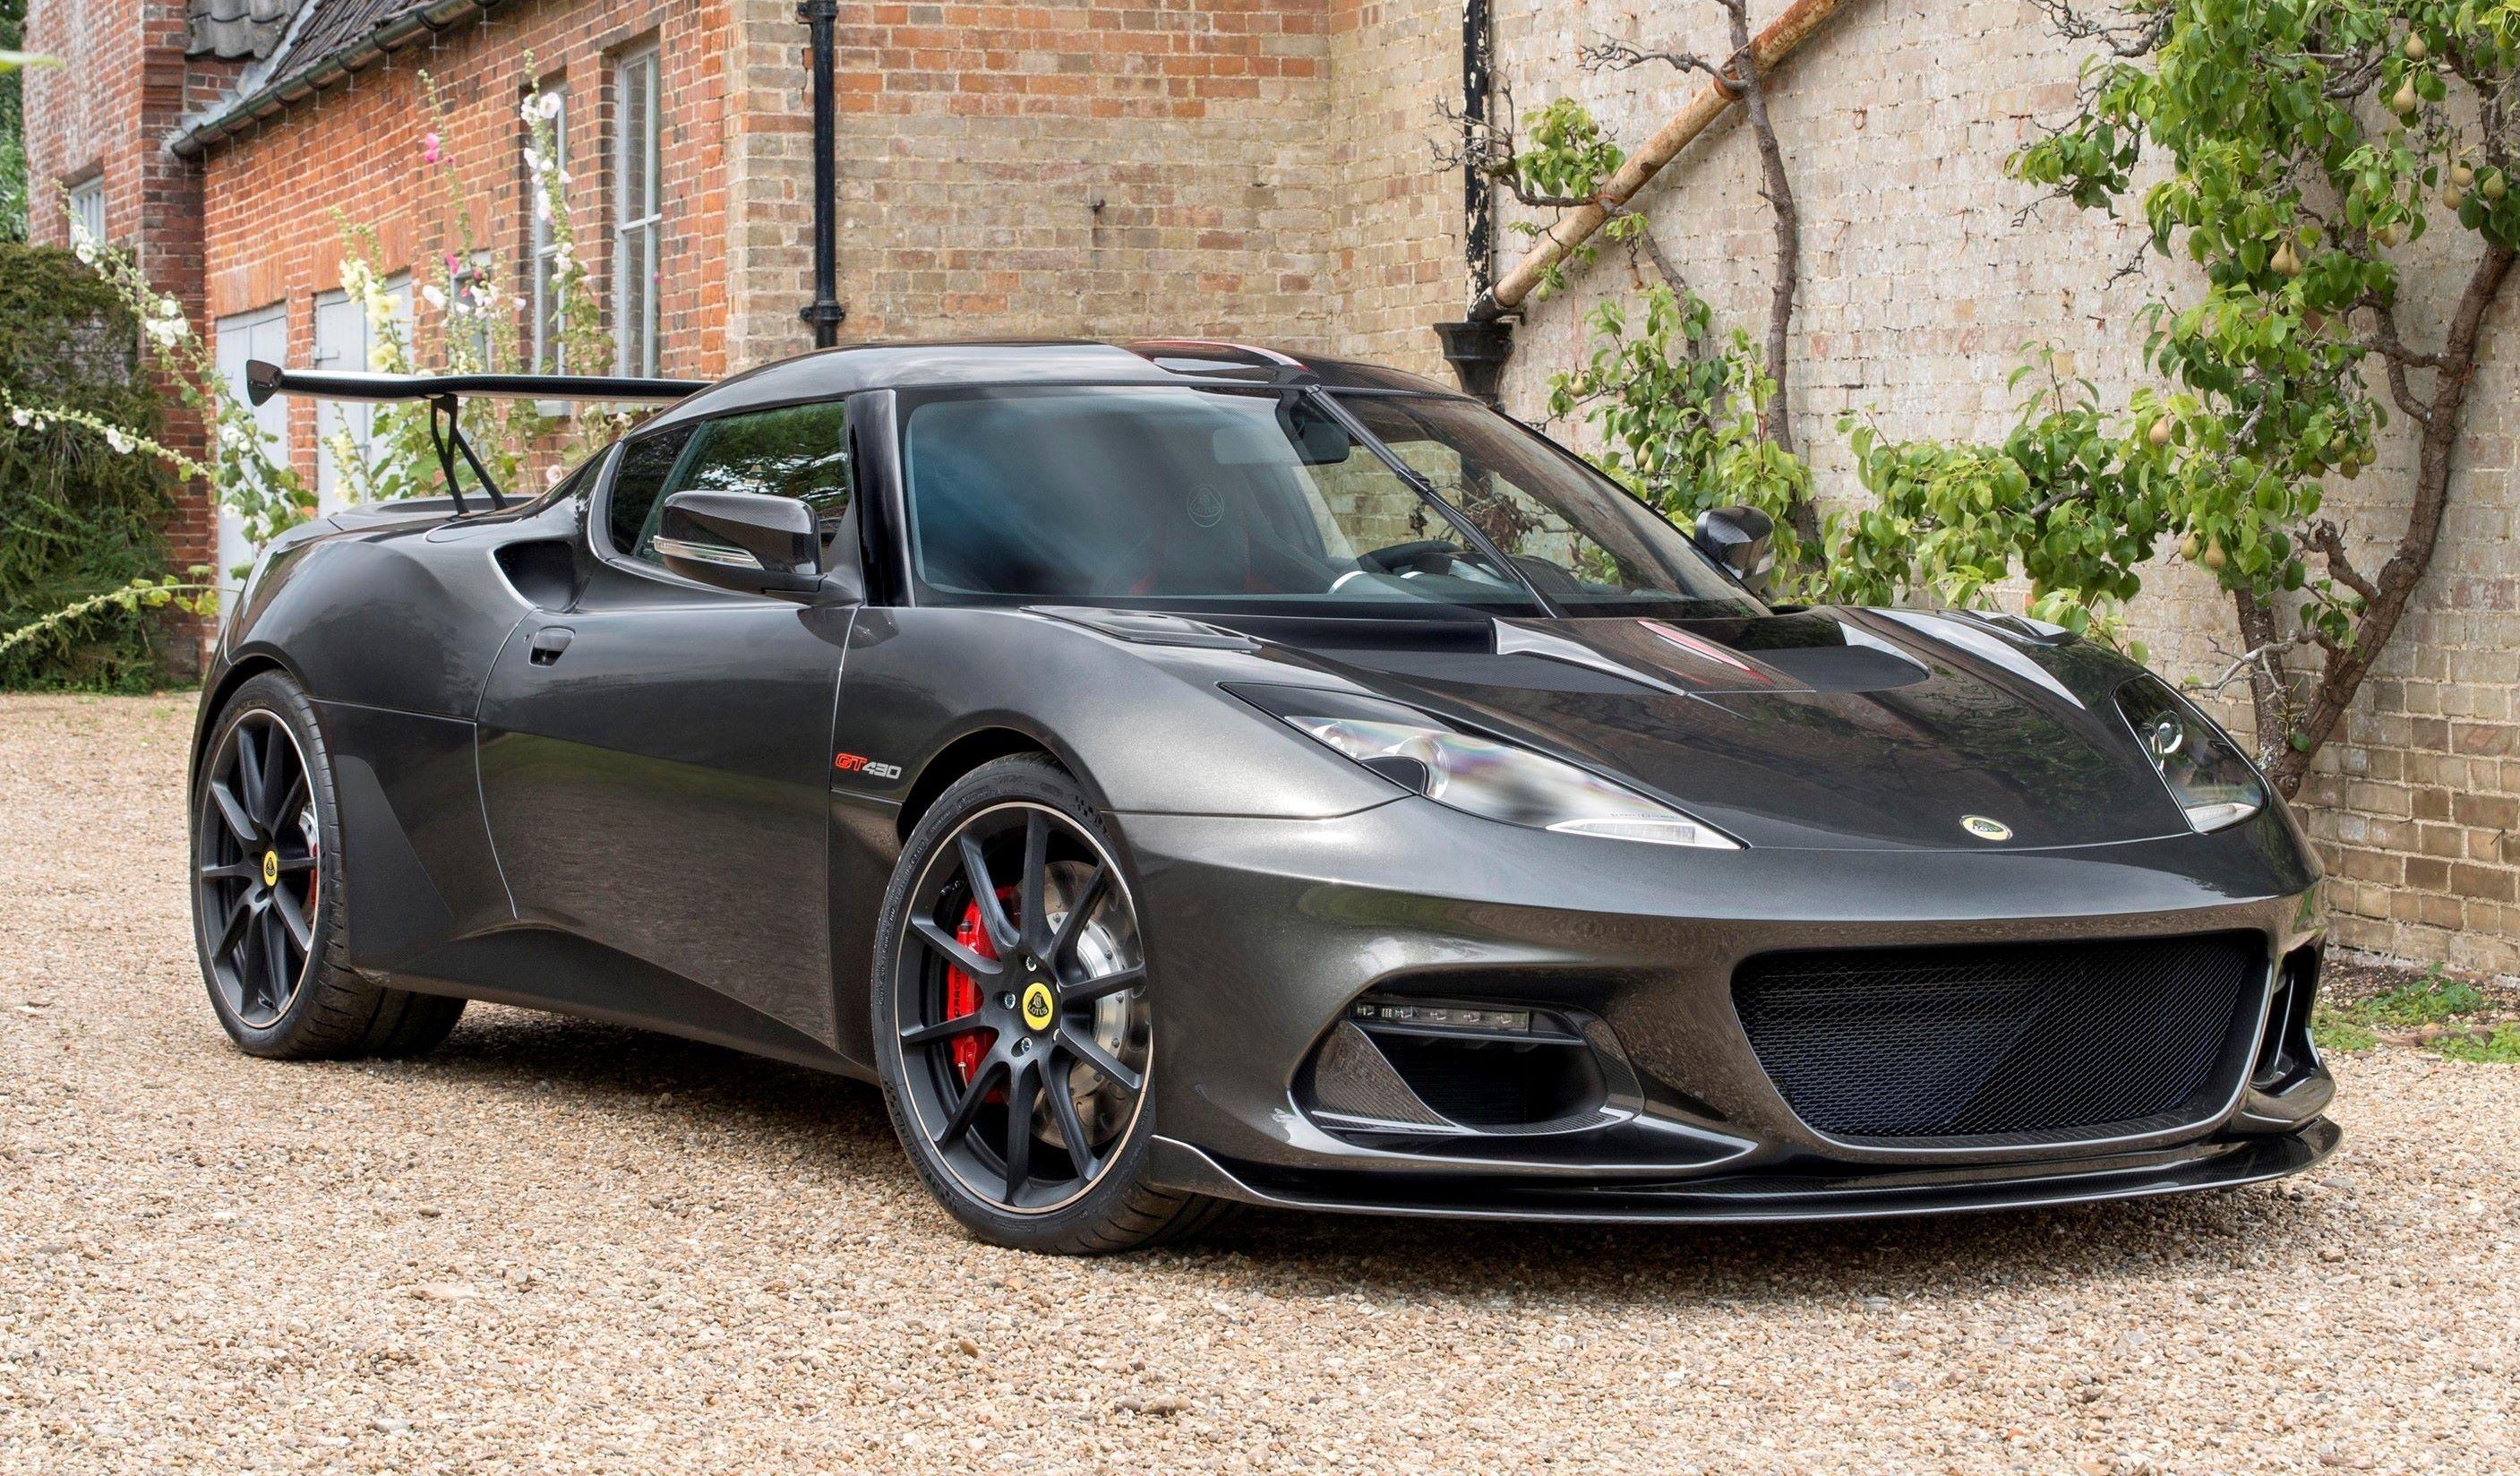 2019 Lotus Evora GT410 Exterior | New sports cars